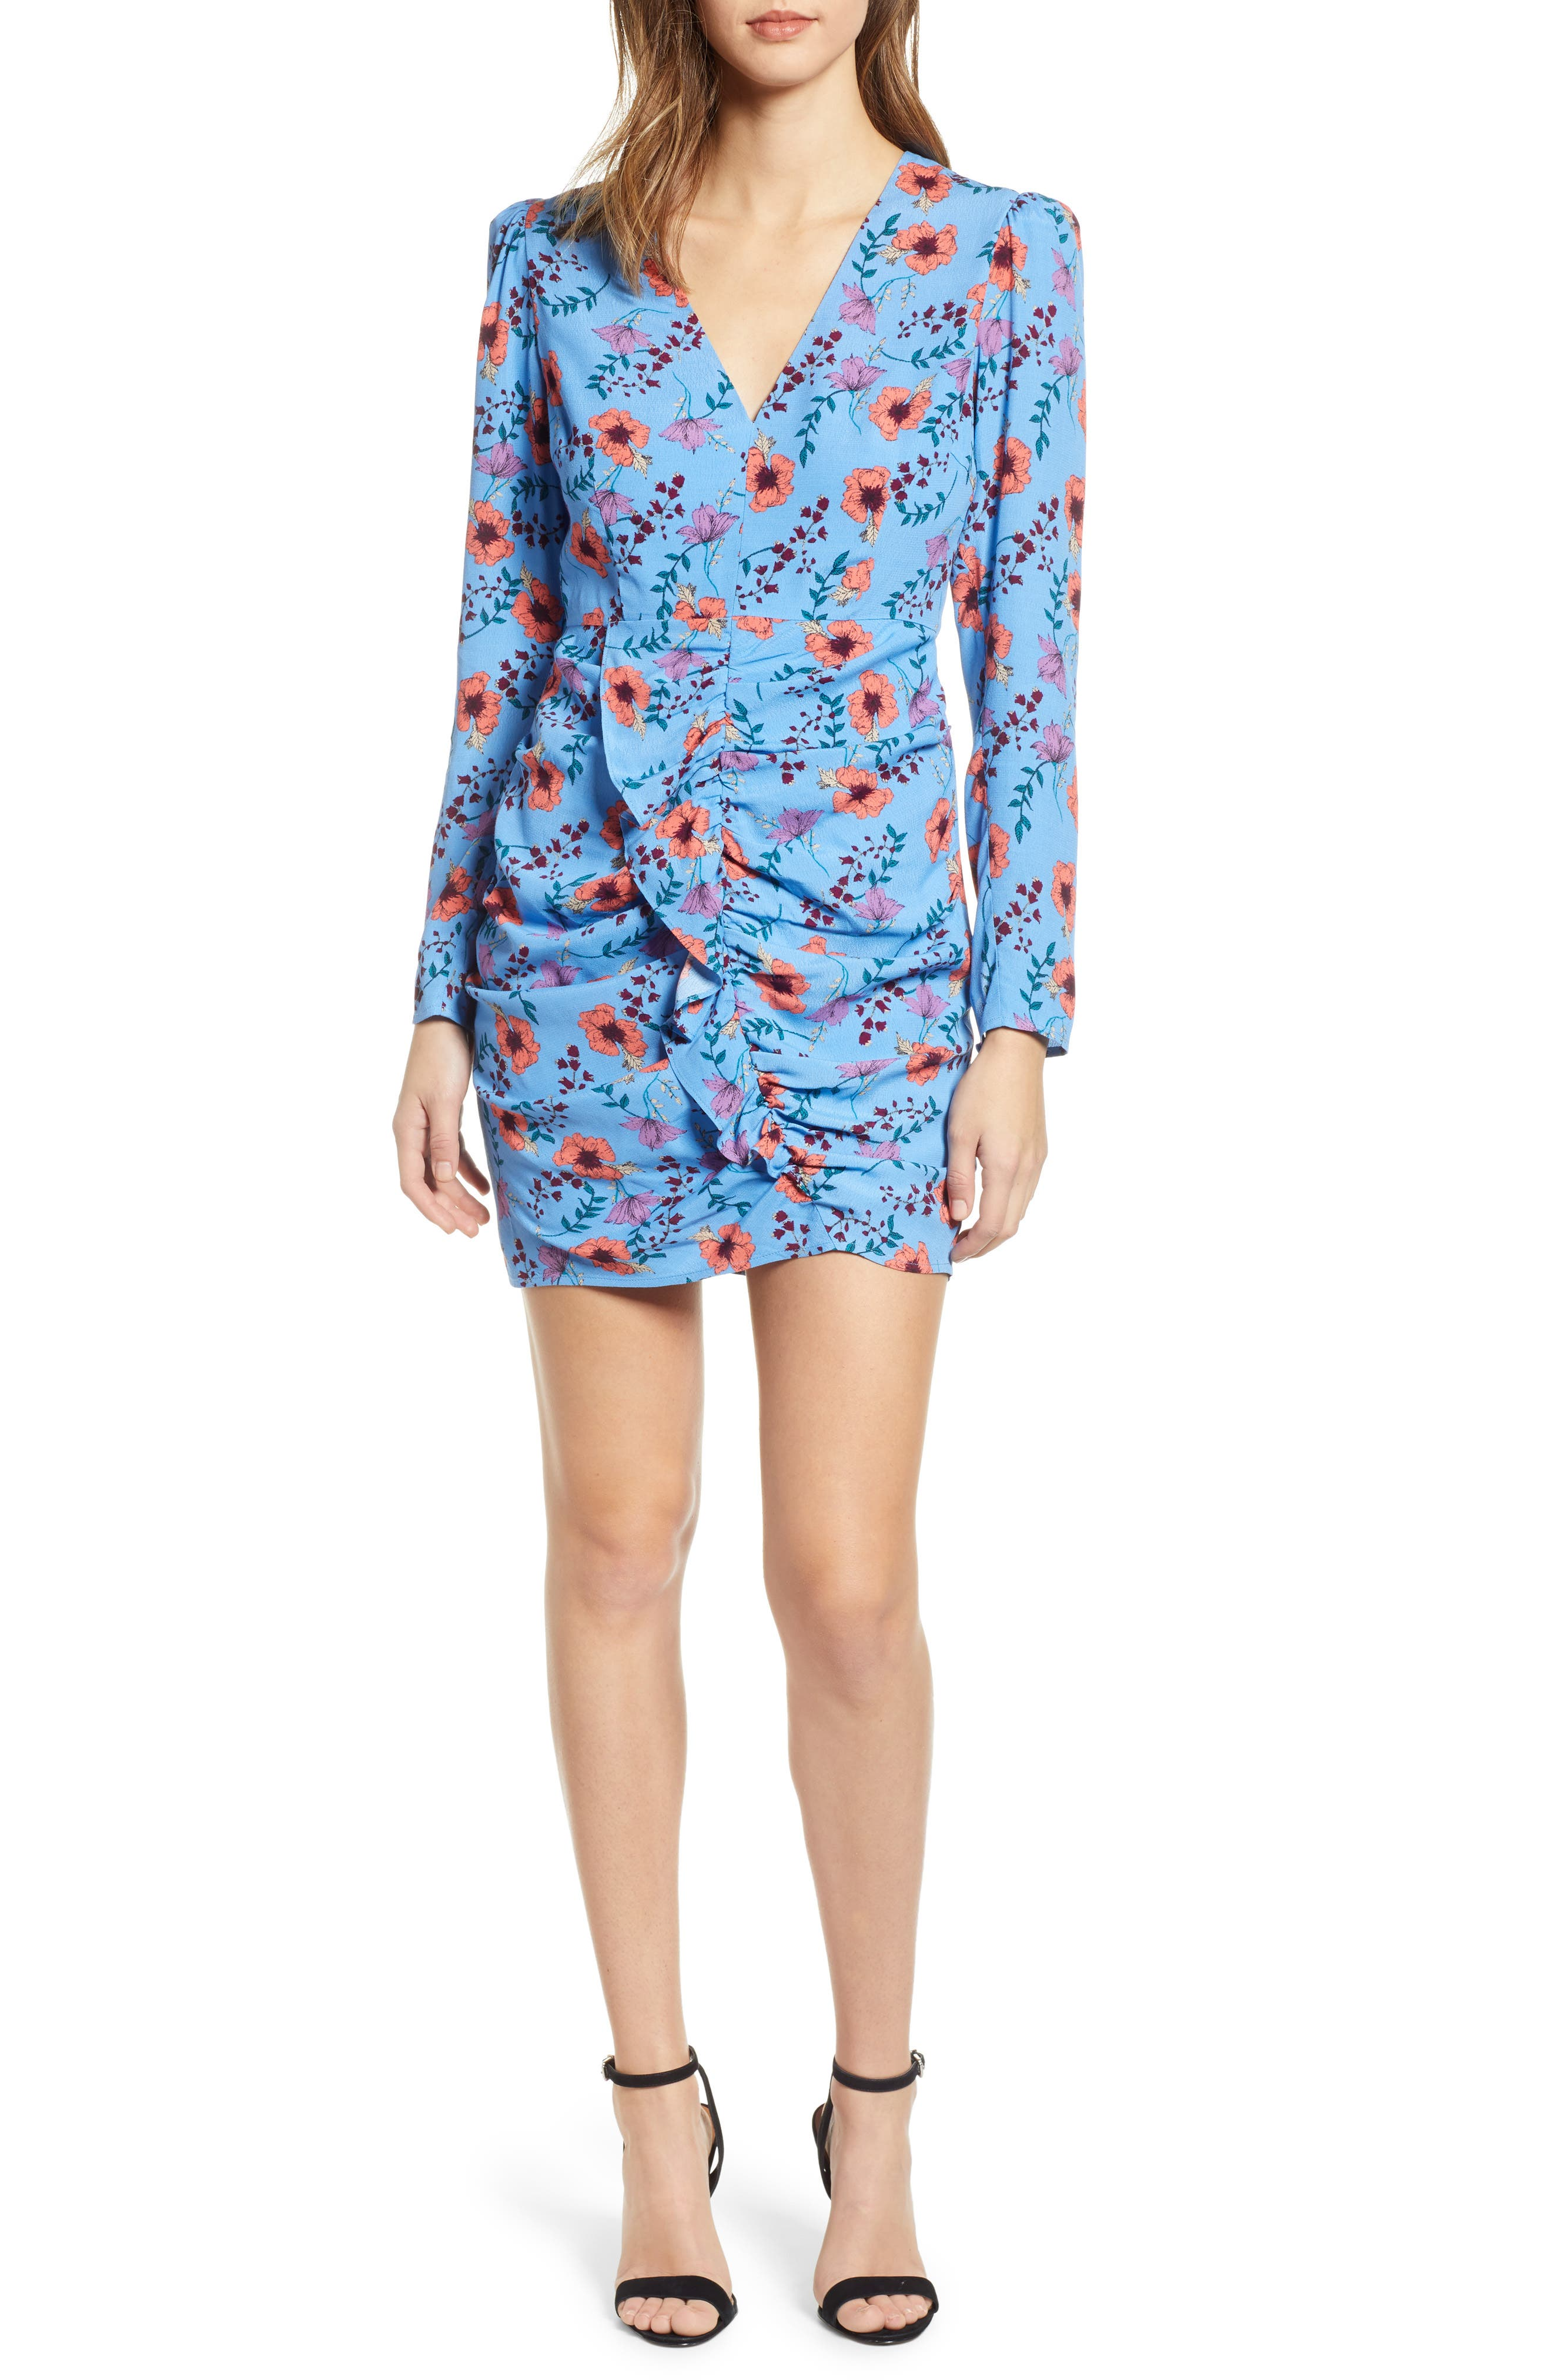 ASTR THE LABEL, Floral Print Ruched Dress, Main thumbnail 1, color, BLUE MULTI FLORAL